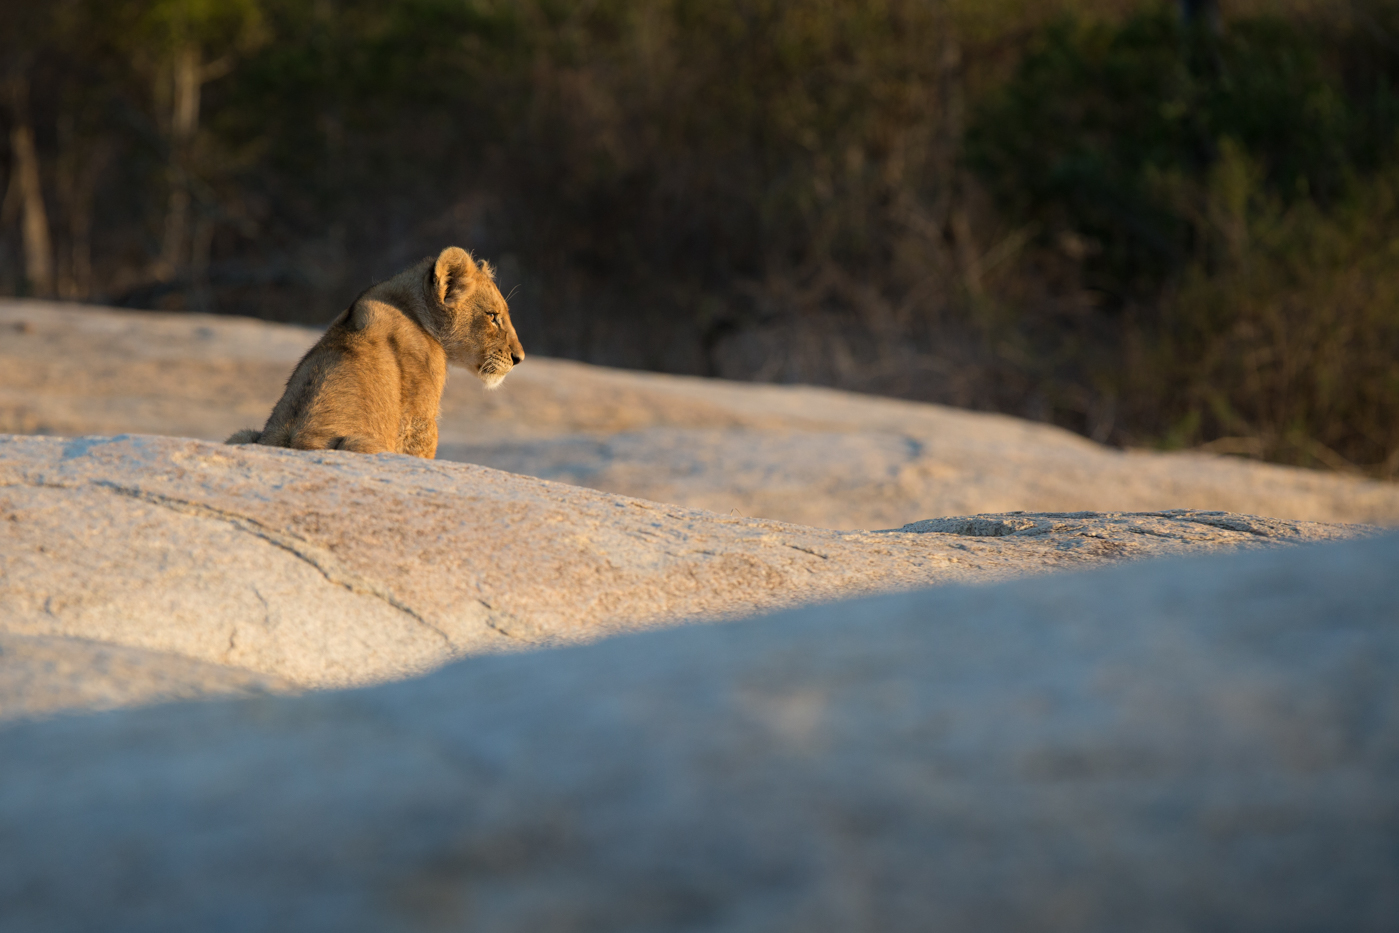 cub-on-rock